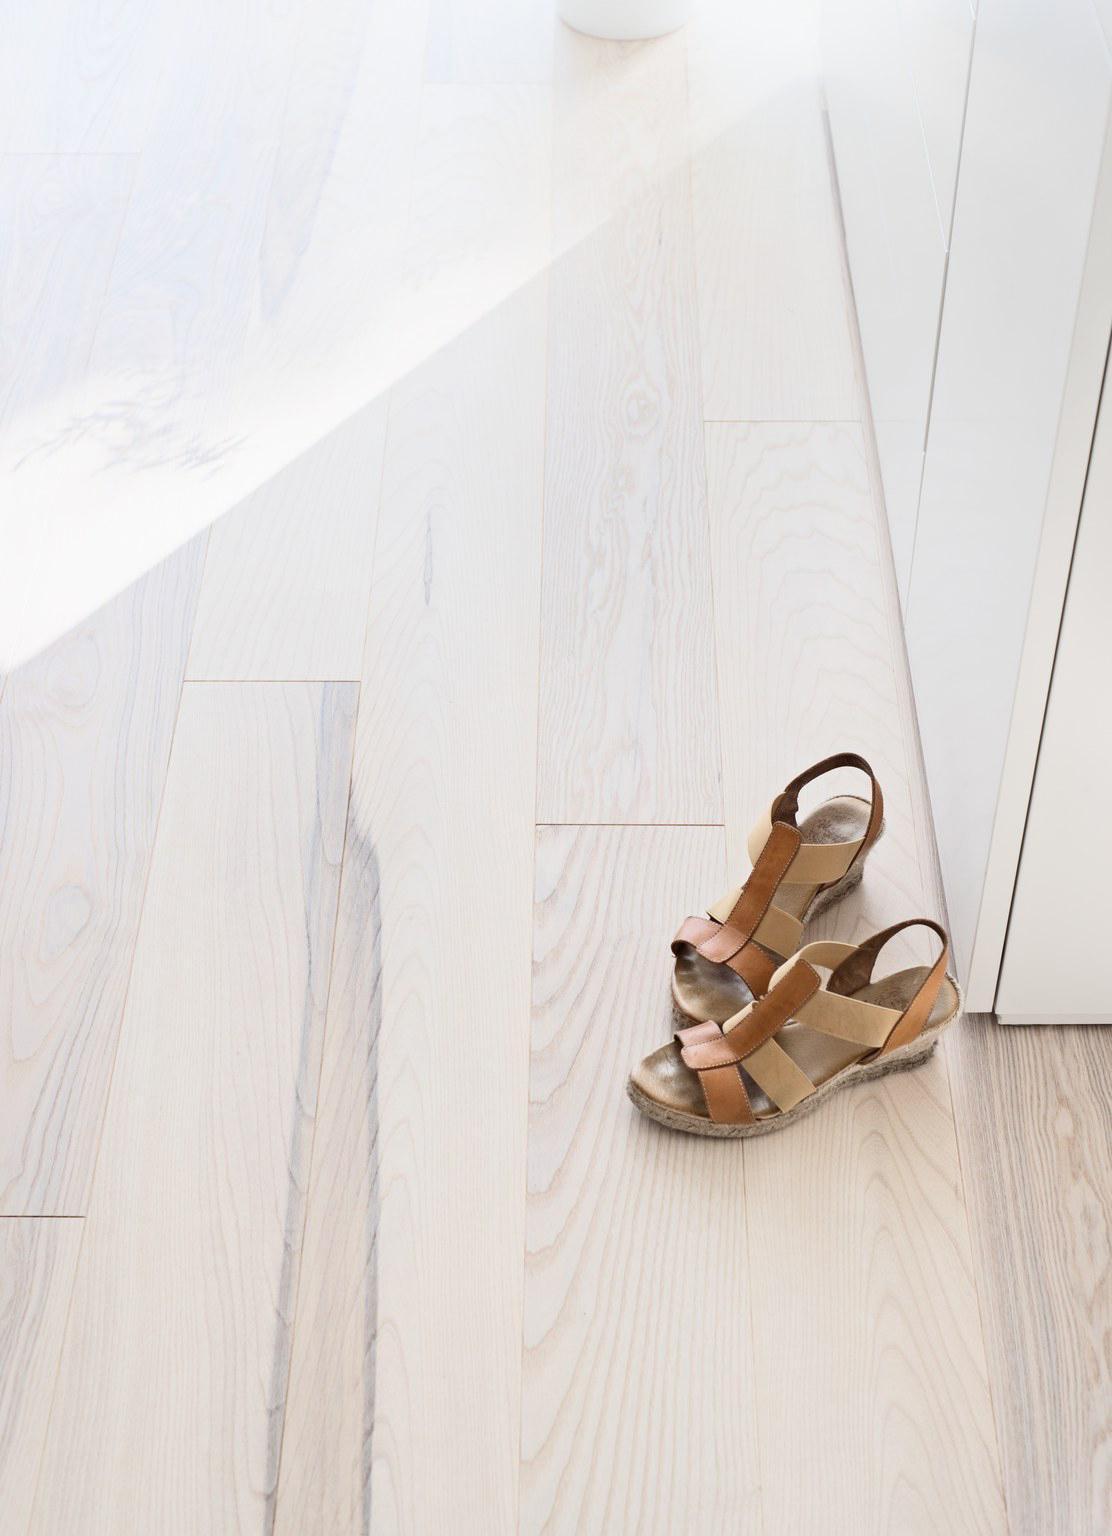 Timberwise-saarni-ash-olive-hiottu-sand-valkomattalakattu-white-matt-lacquered (4)